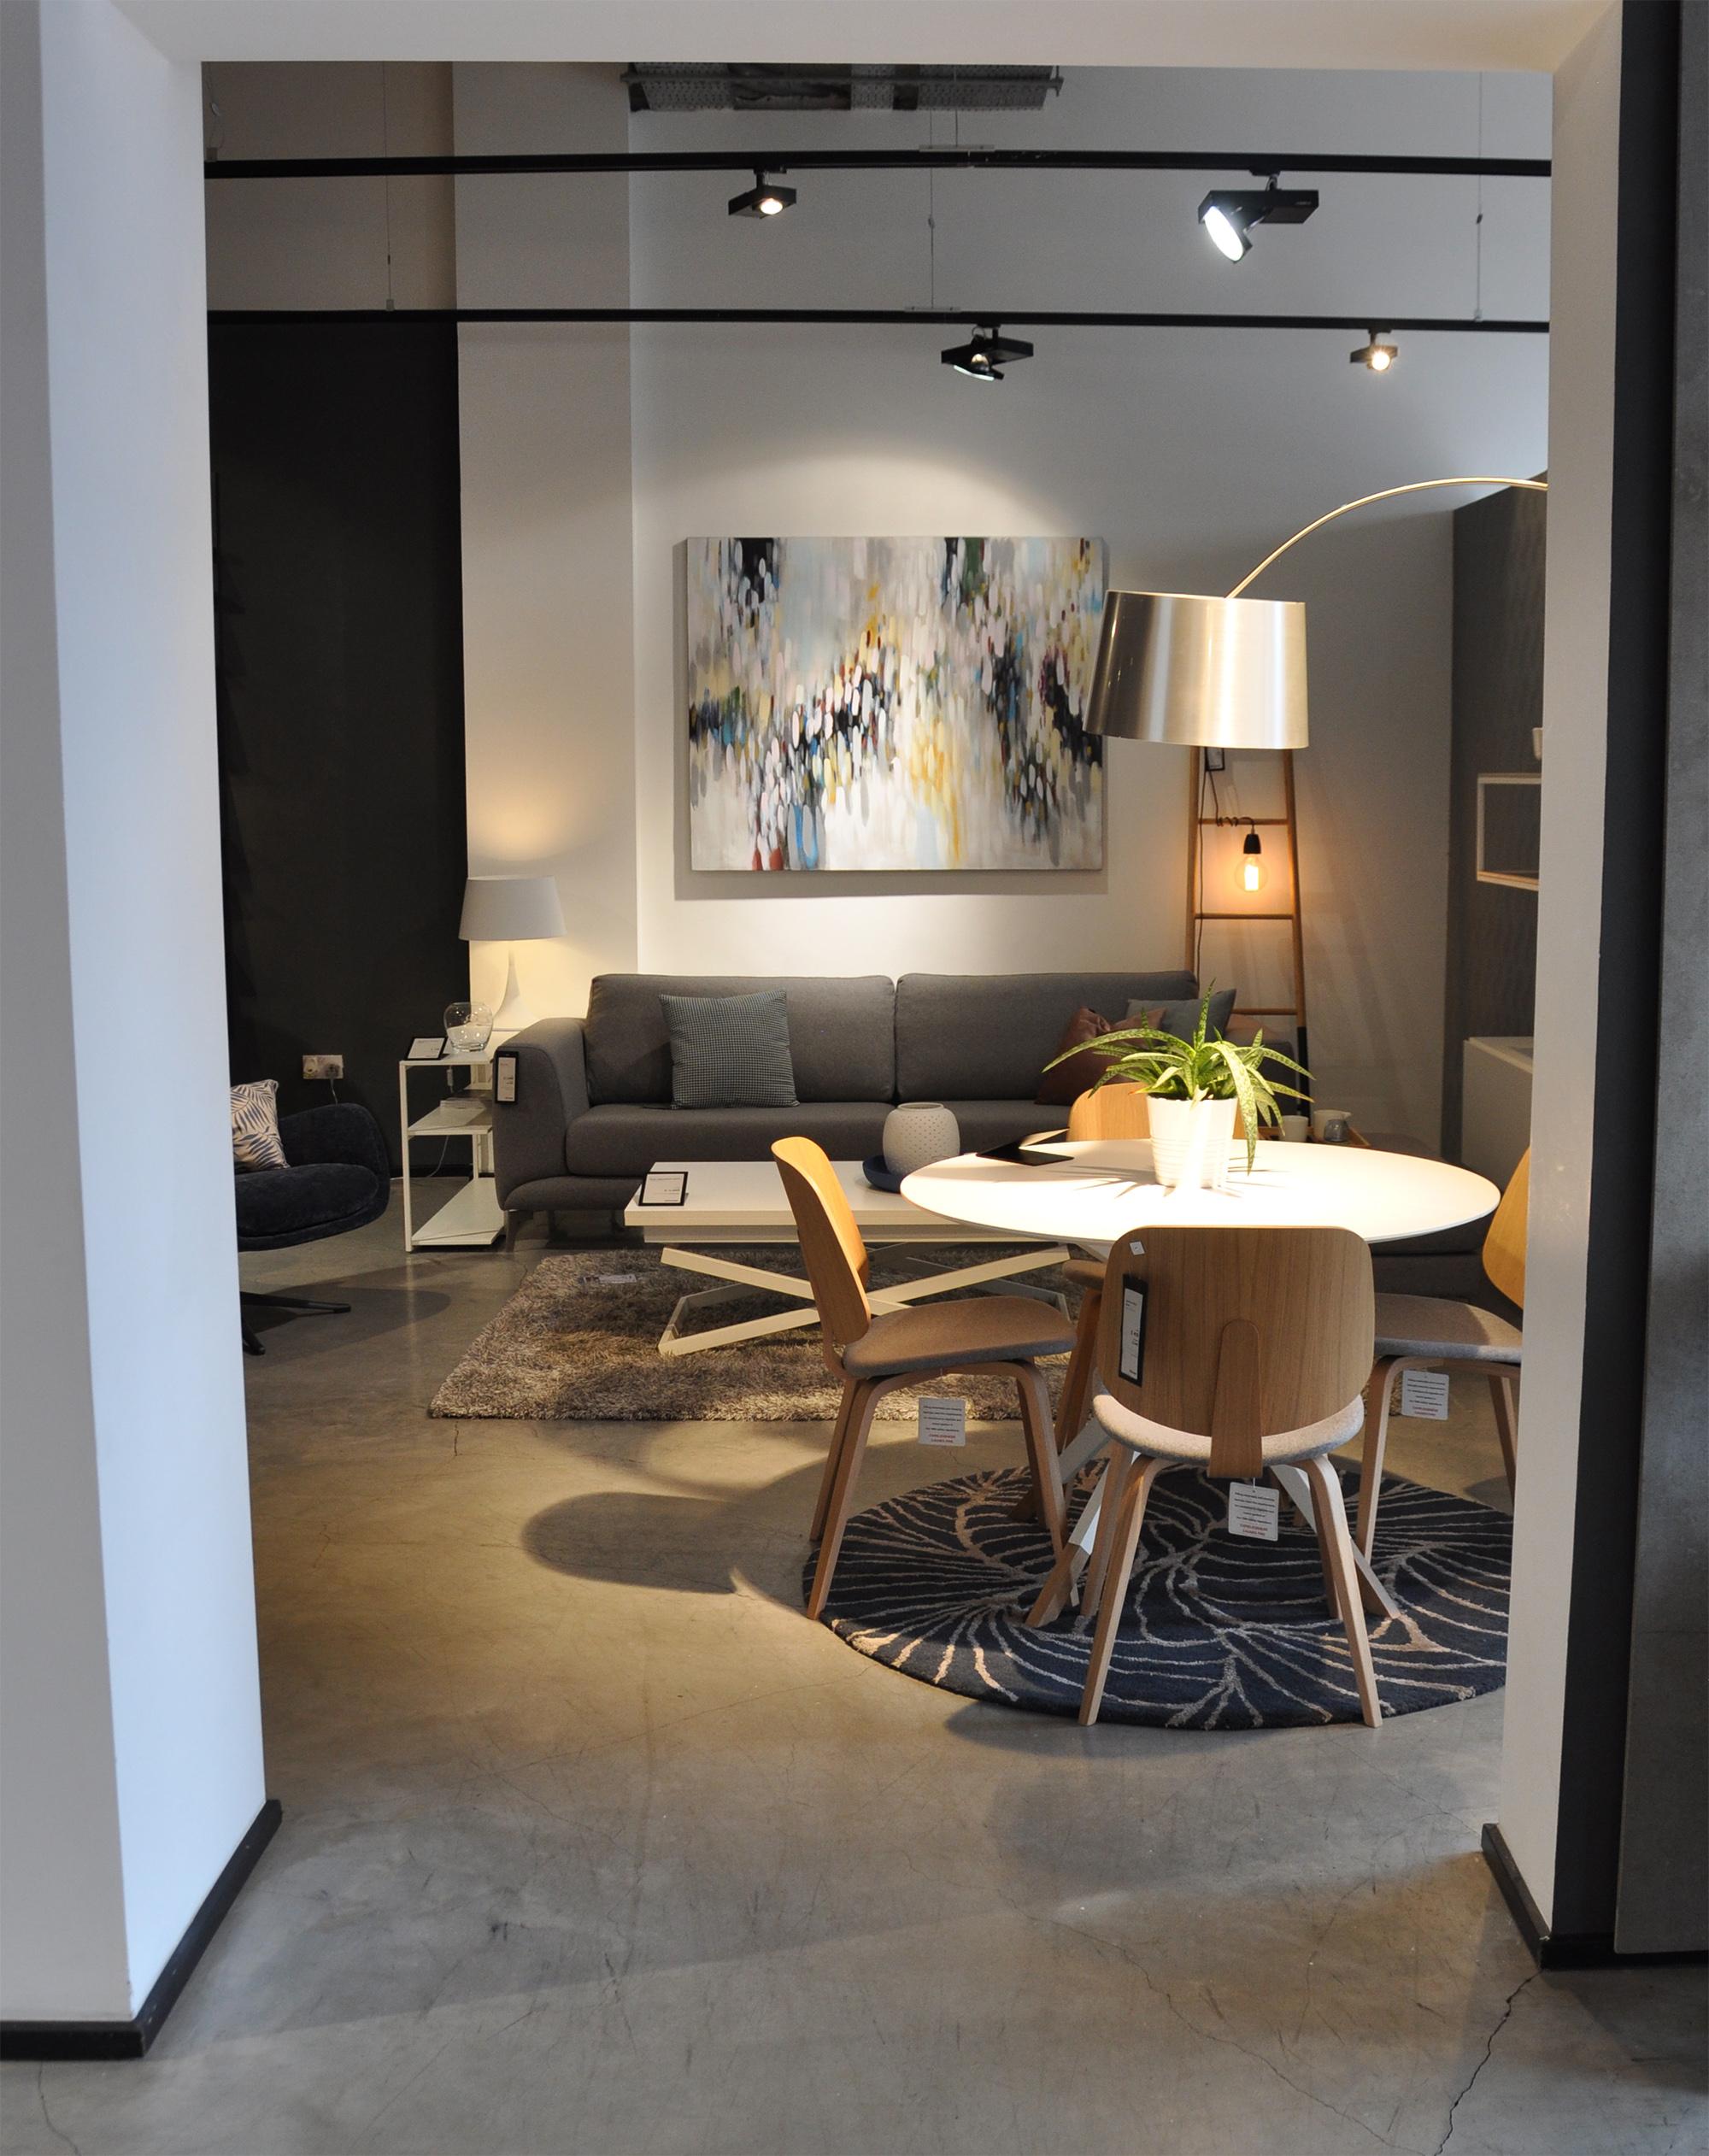 Aarhus chairs ,  Billund table ,  Ankara rug ,  Kuta floor-standing lamp .